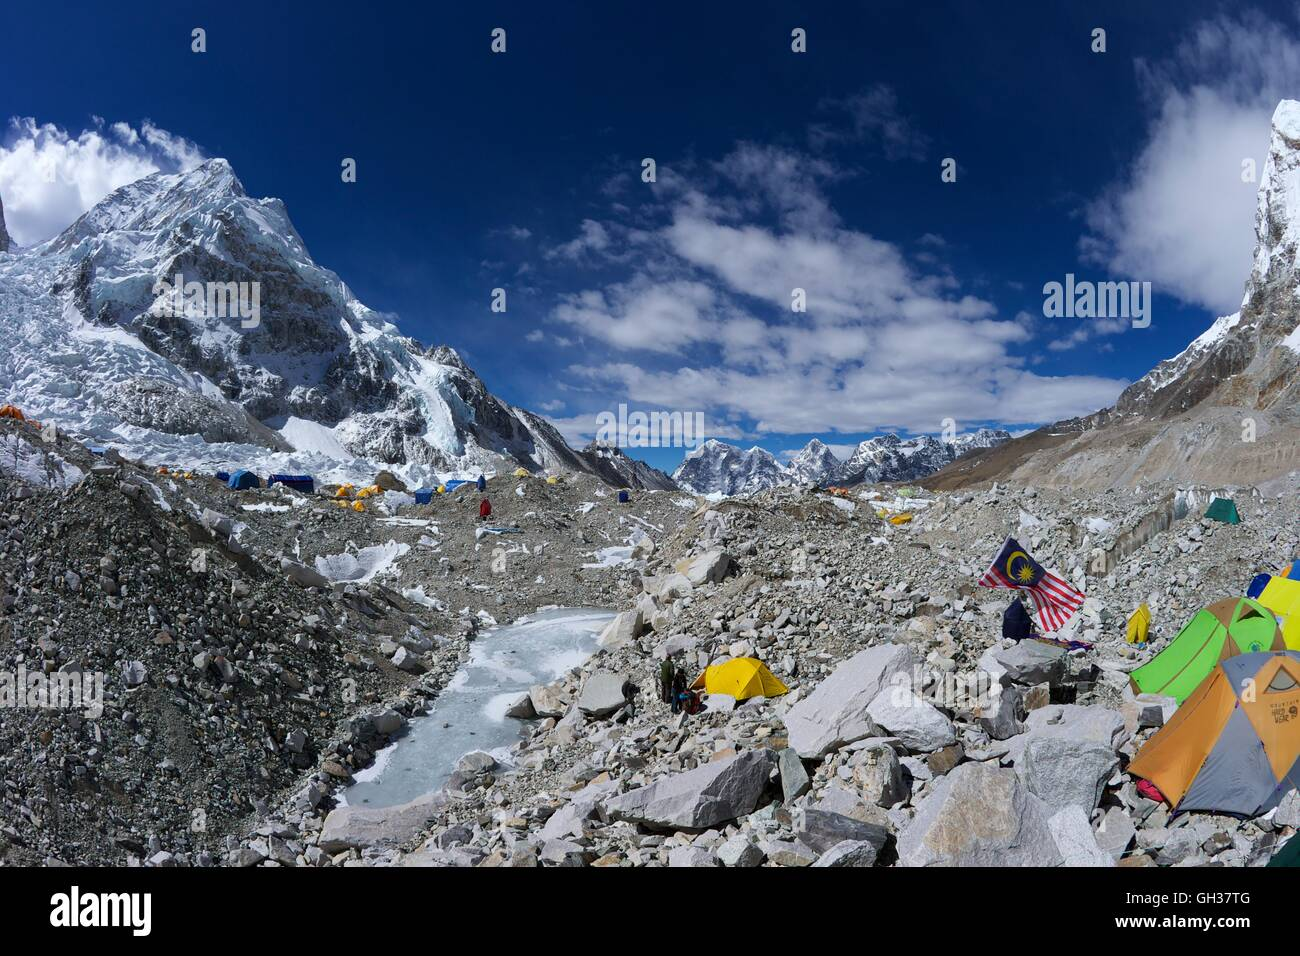 Khumbu Eisfall von Everest Base Camp, Sagarmatha National Park, solukhumbu District, Nepal, Asien Stockbild